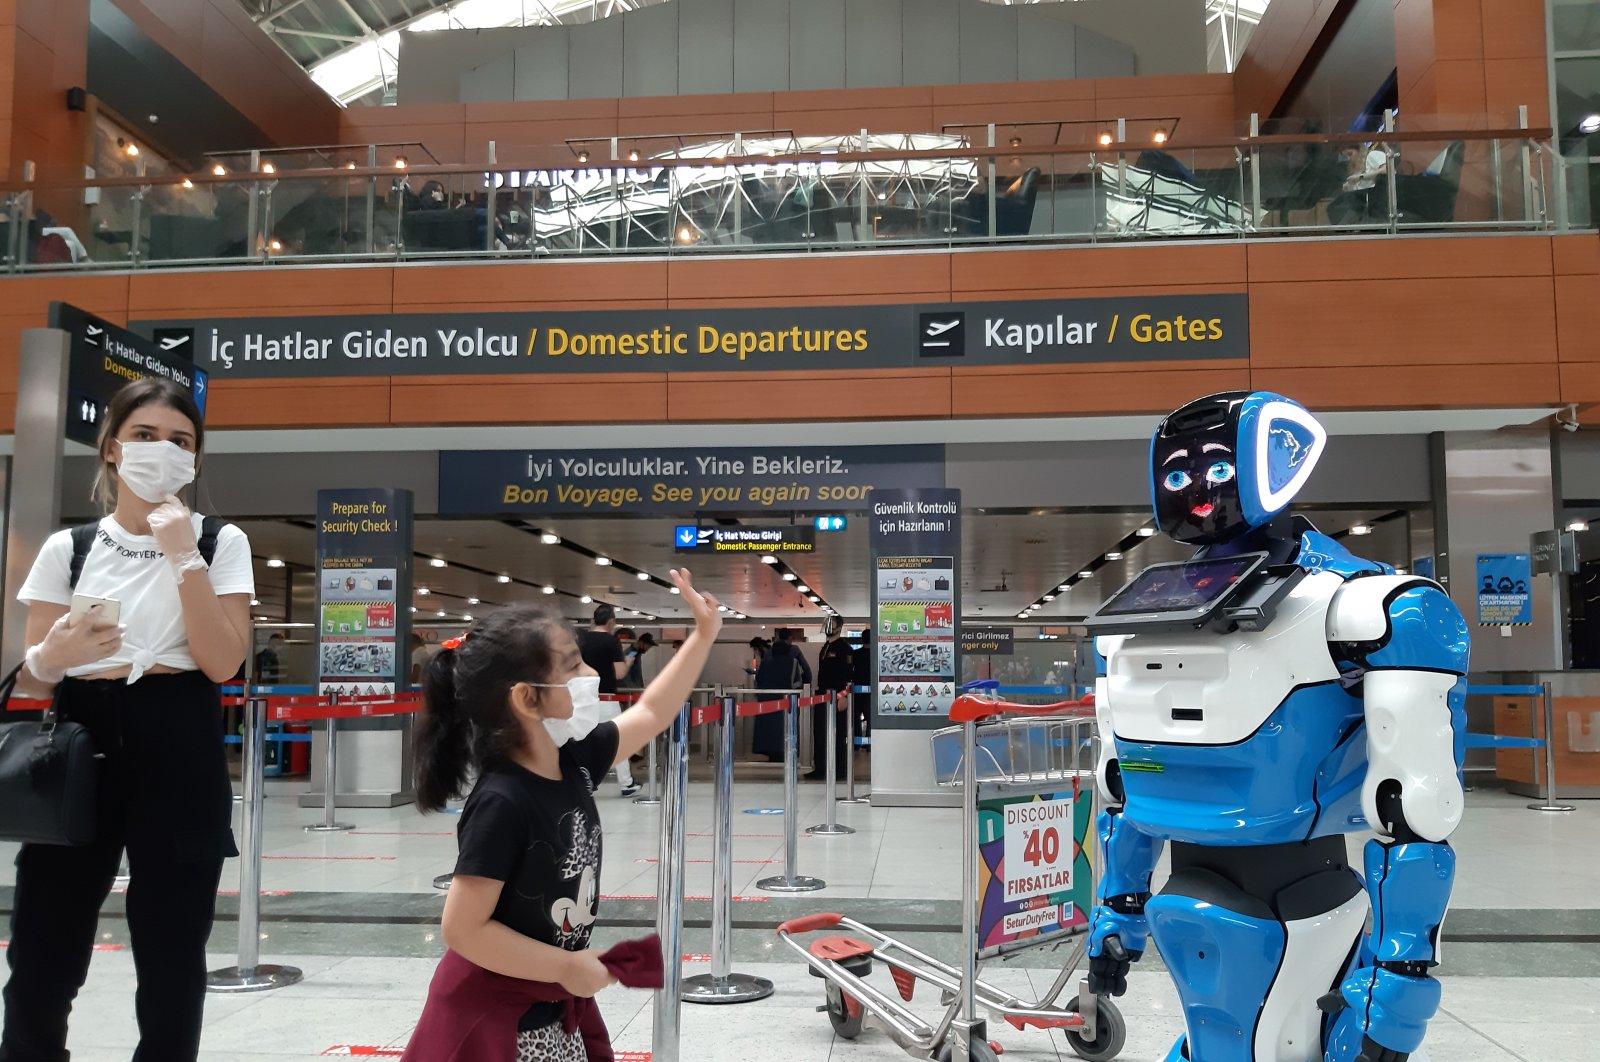 """Aerobot"" at Istanbul's Sabiha Gökçen Airport informs passengers about flights while warning on measures against the coronavirus outbreak. (AA Photo)"